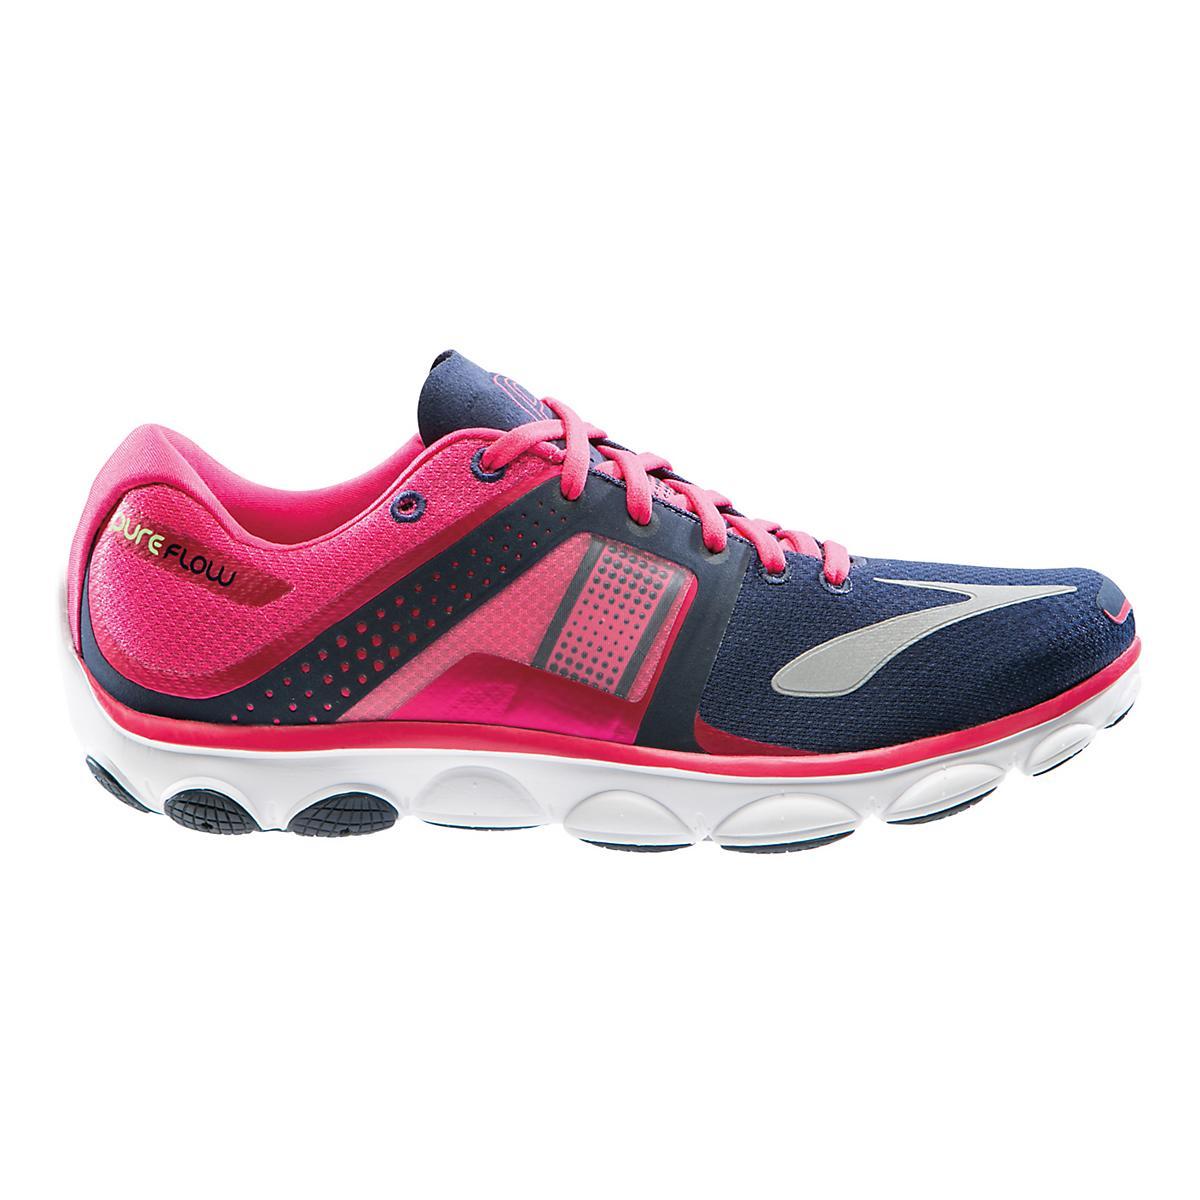 6bdefd4c5dd Womens Brooks PureFlow 4 Running Shoe at Road Runner Sports